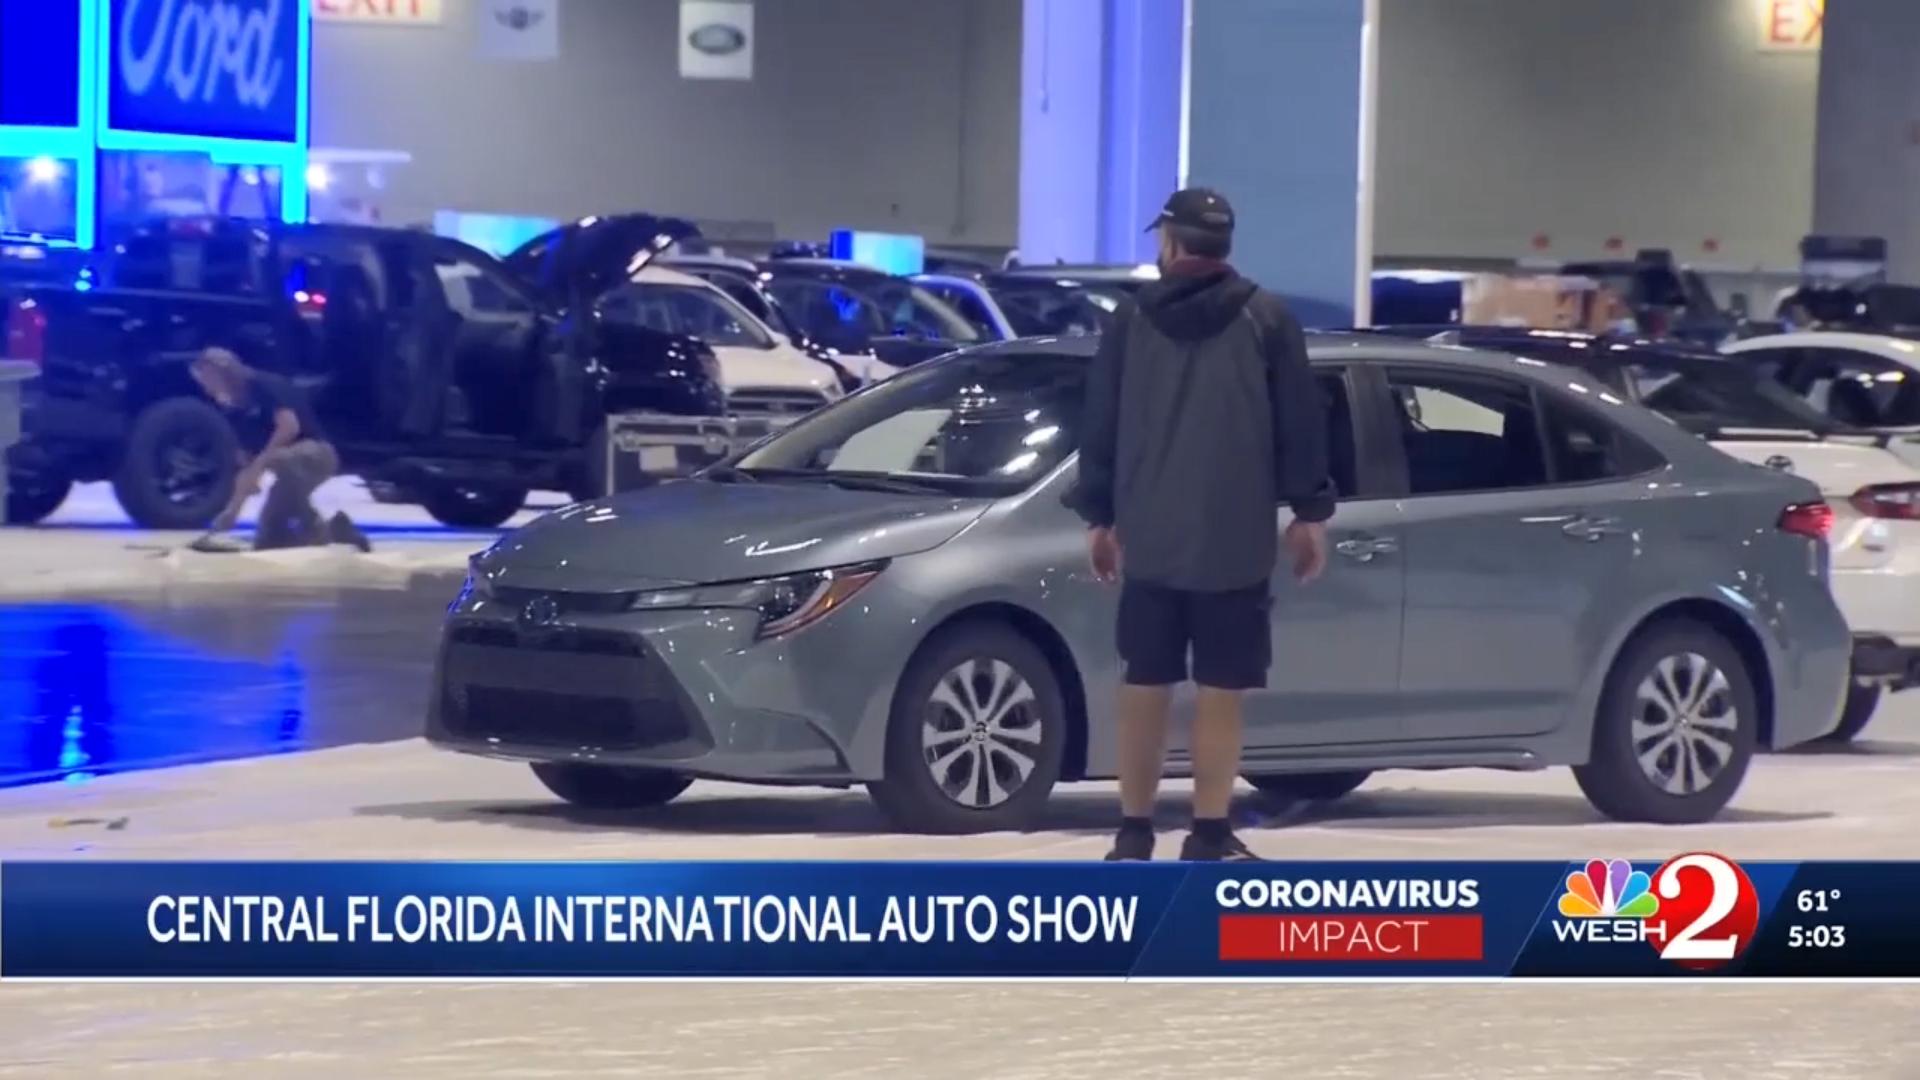 WESH 2 | Orlando Auto Show Safety